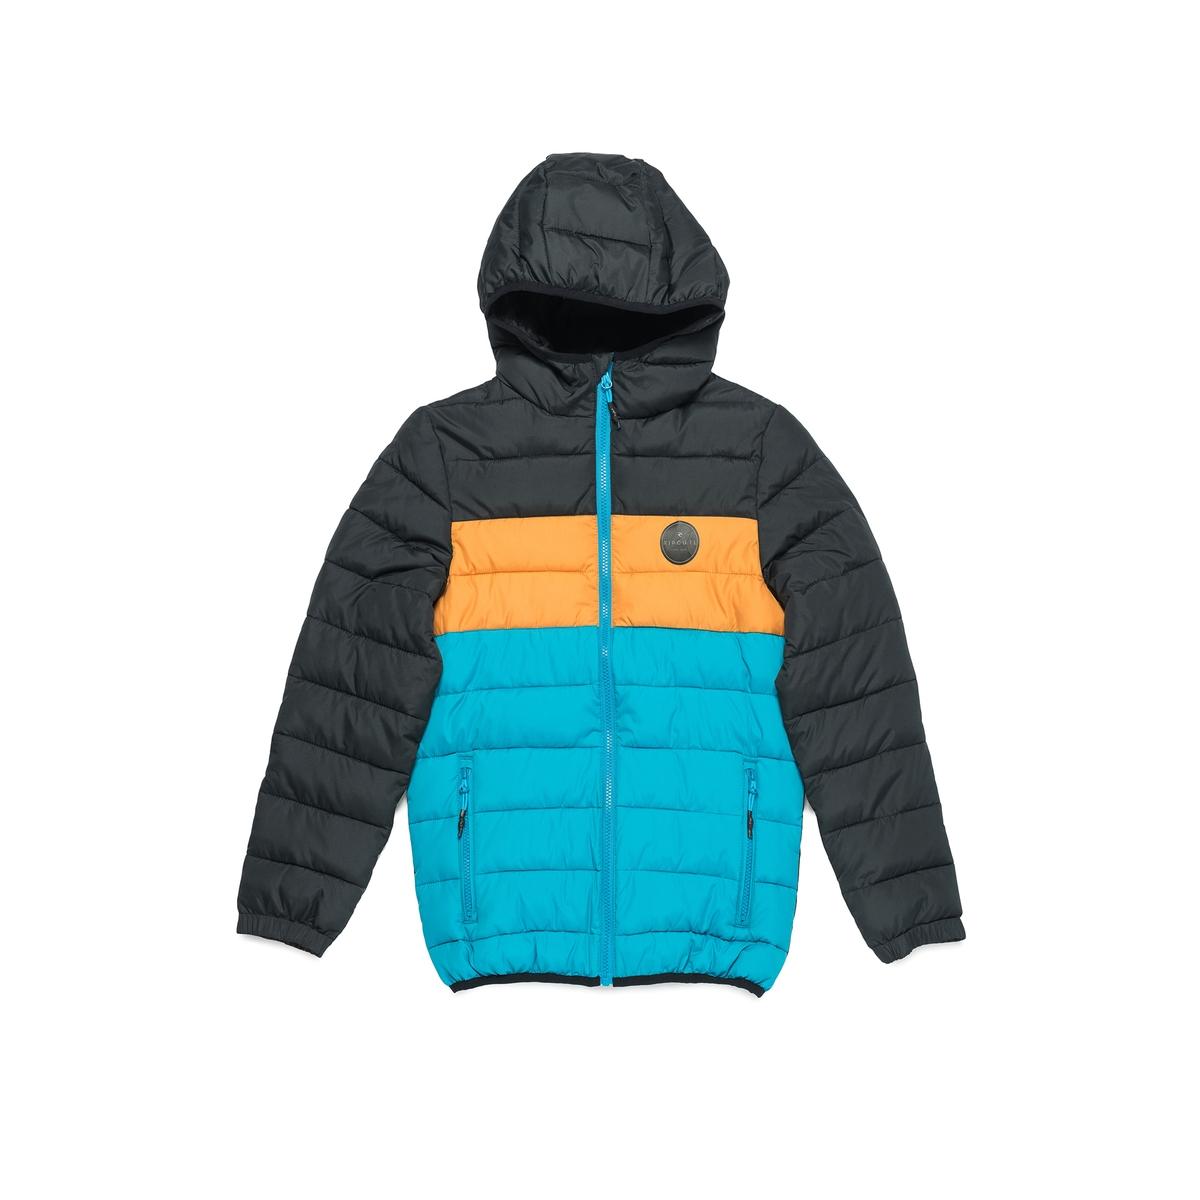 Куртка стеганая в полоску с капюшоном, 8-16 лет туника befree befree be031ewpjx89